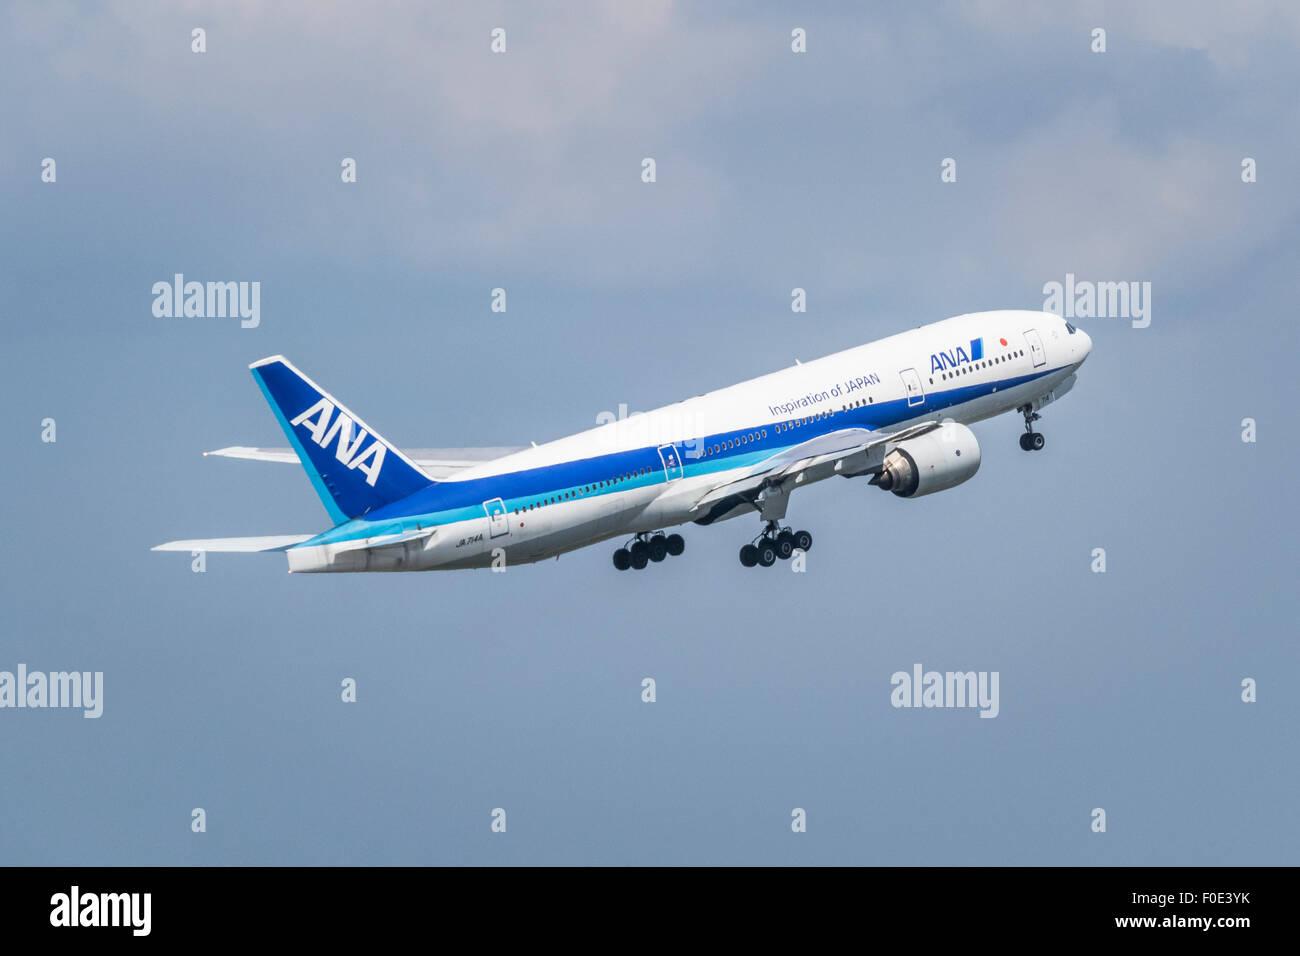 Airplane departing from Haneda Airport in Japan - Stock Image